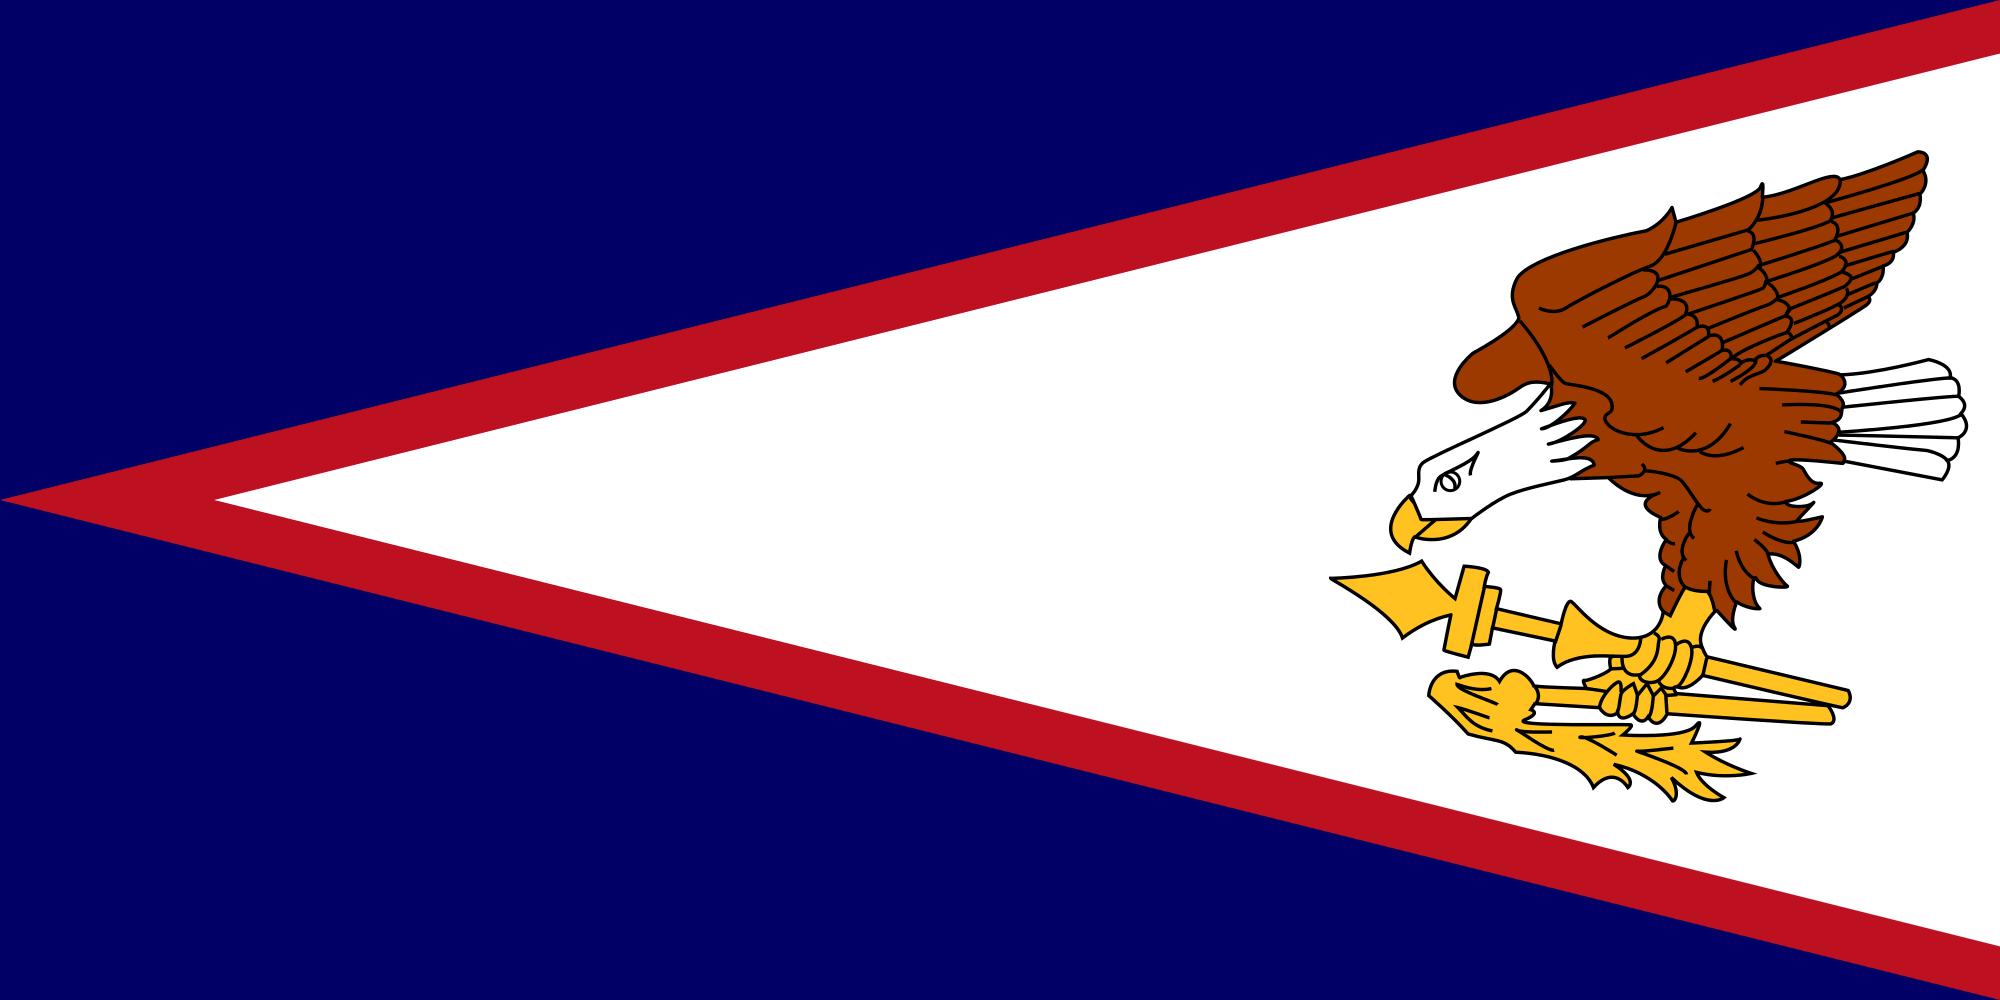 Resultado de imagen para Samoa Islands png